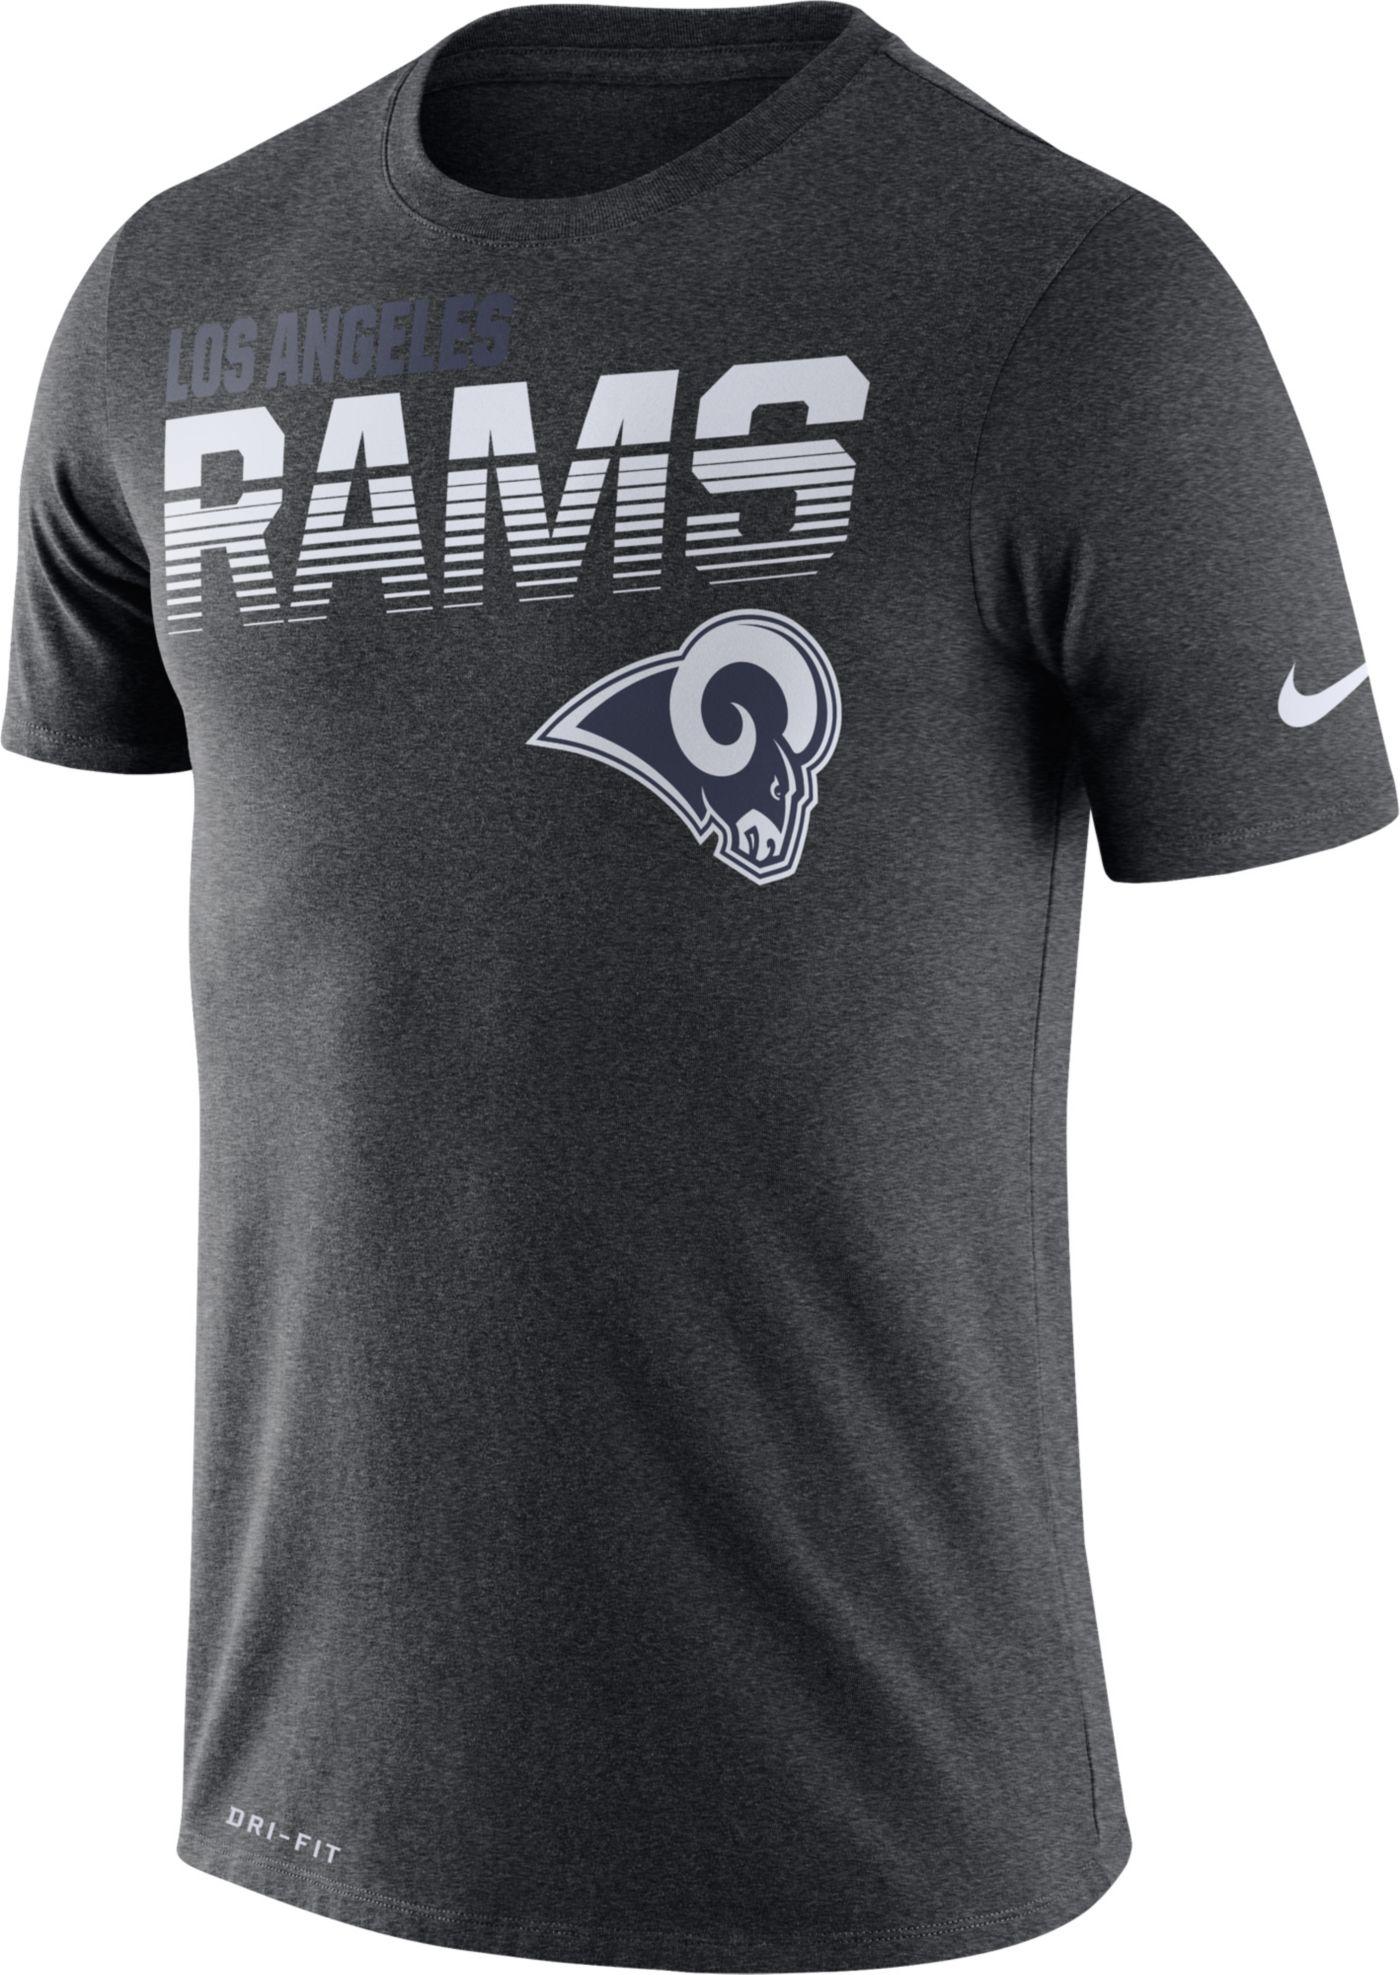 Nike Men's Los Angeles Rams Sideline Legend Performance Charcoal T-Shirt